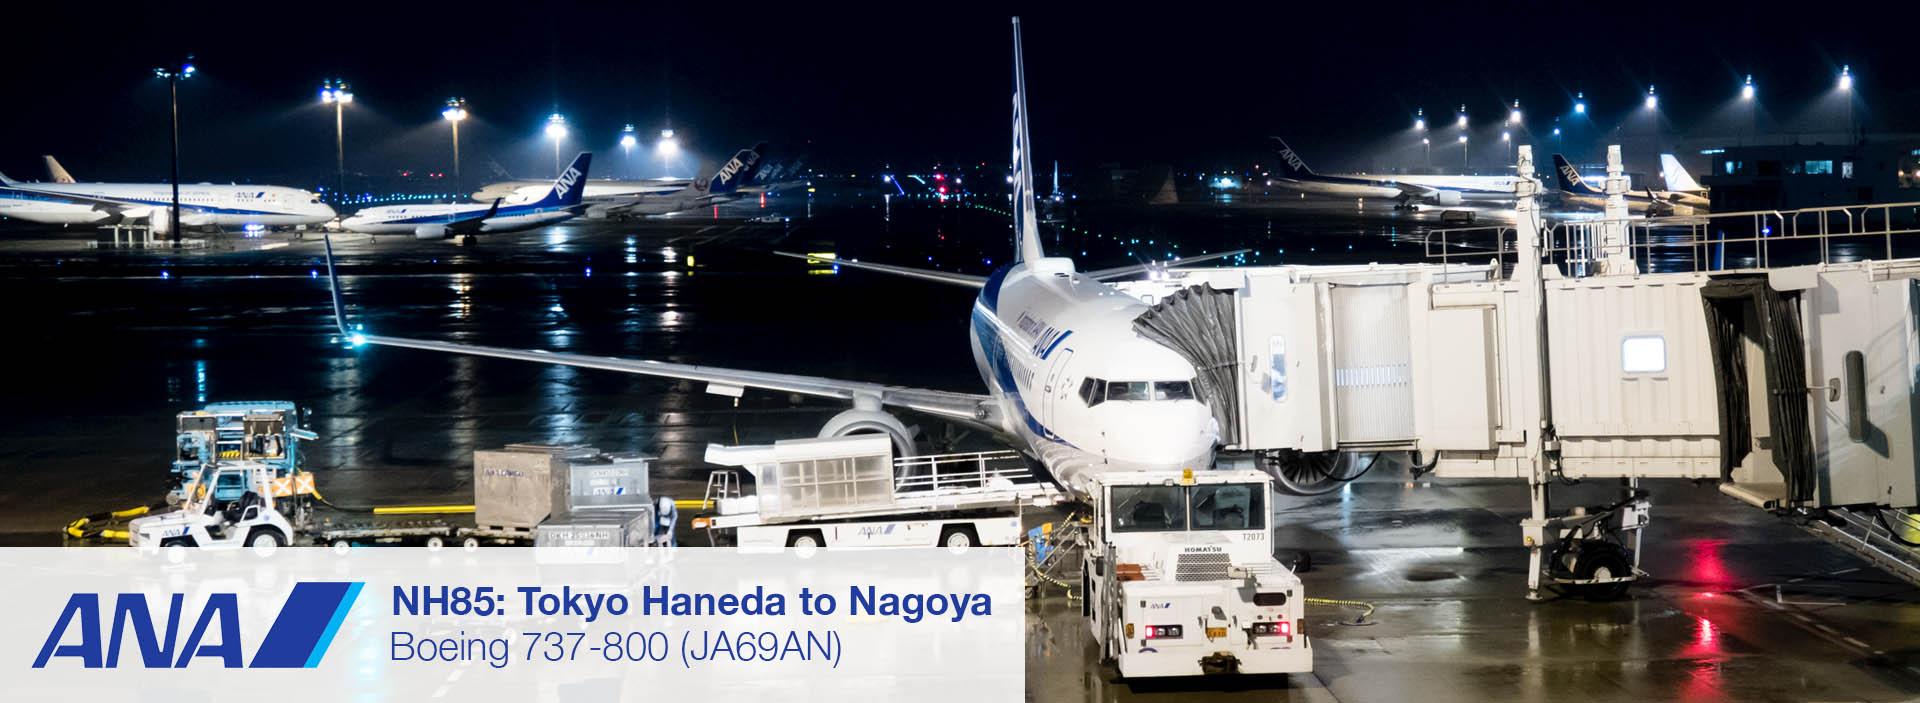 Flight Review: ANA 737-800 Economy Class from Tokyo Haneda to Nagoya Centrair